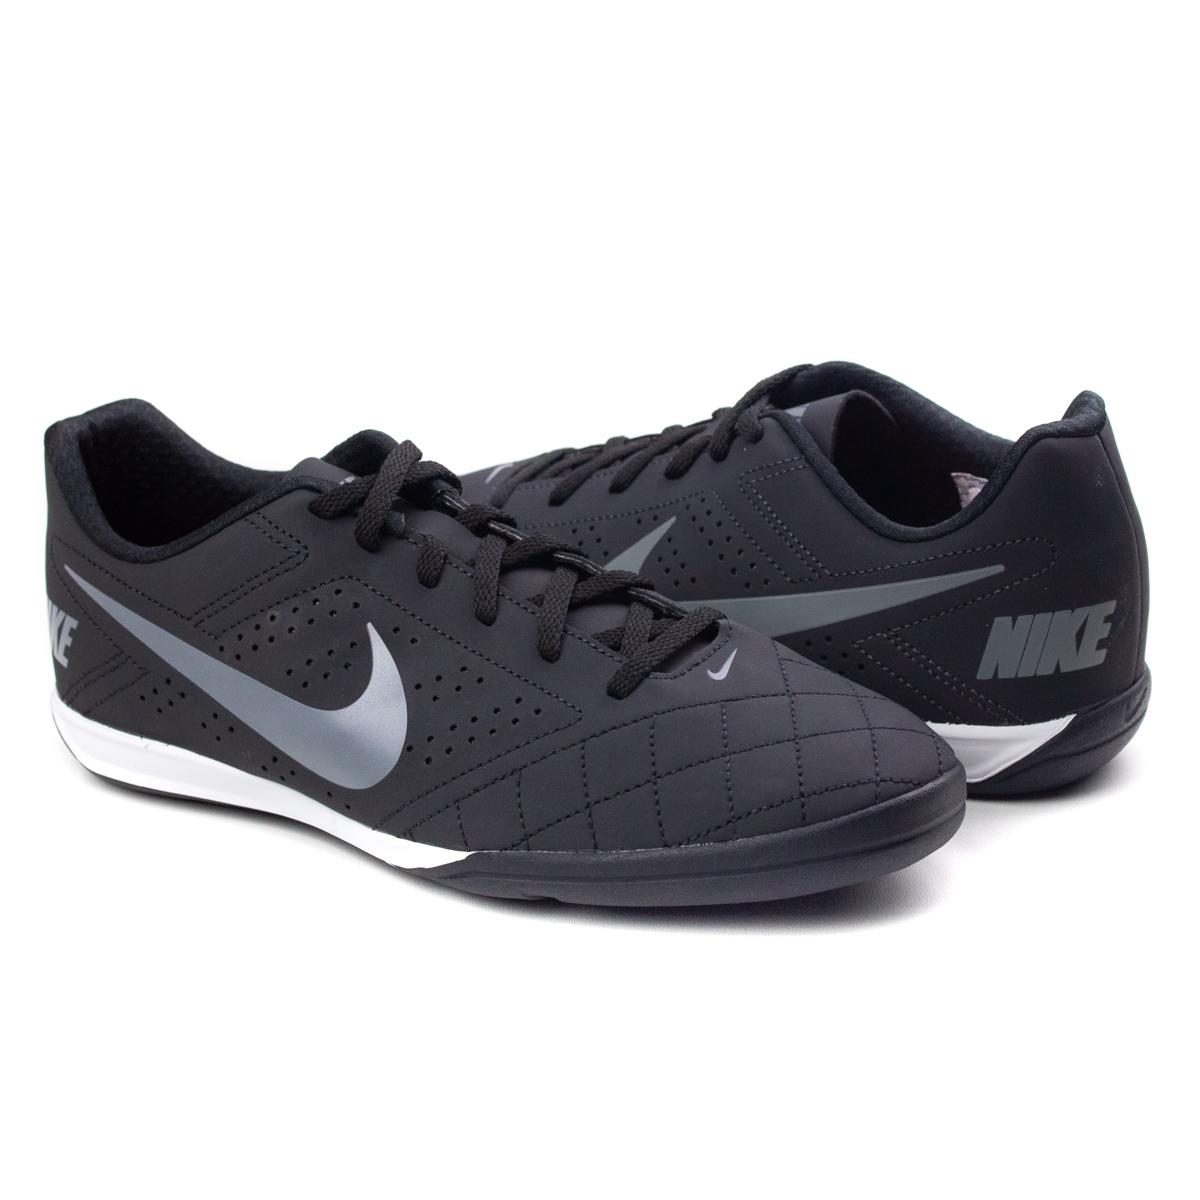 Tênis Indoor Beco 2 Nike - Black/cool grey-white